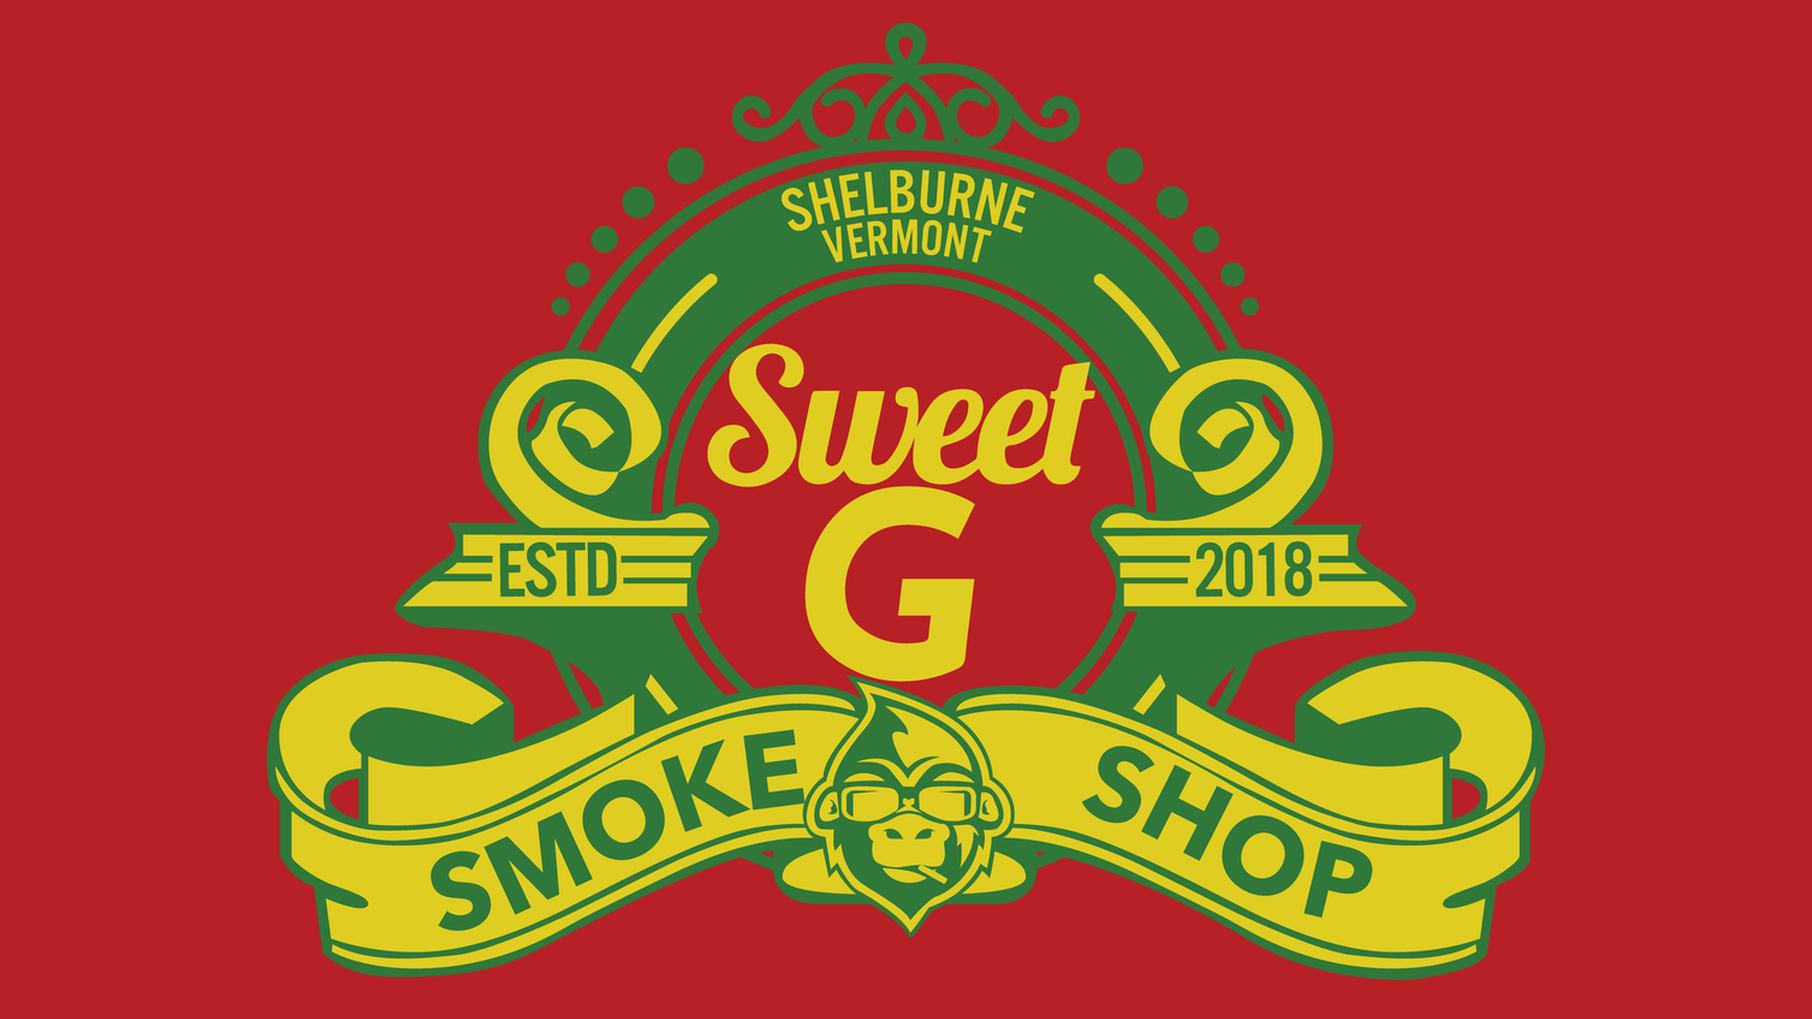 Sweet G Smokeshop